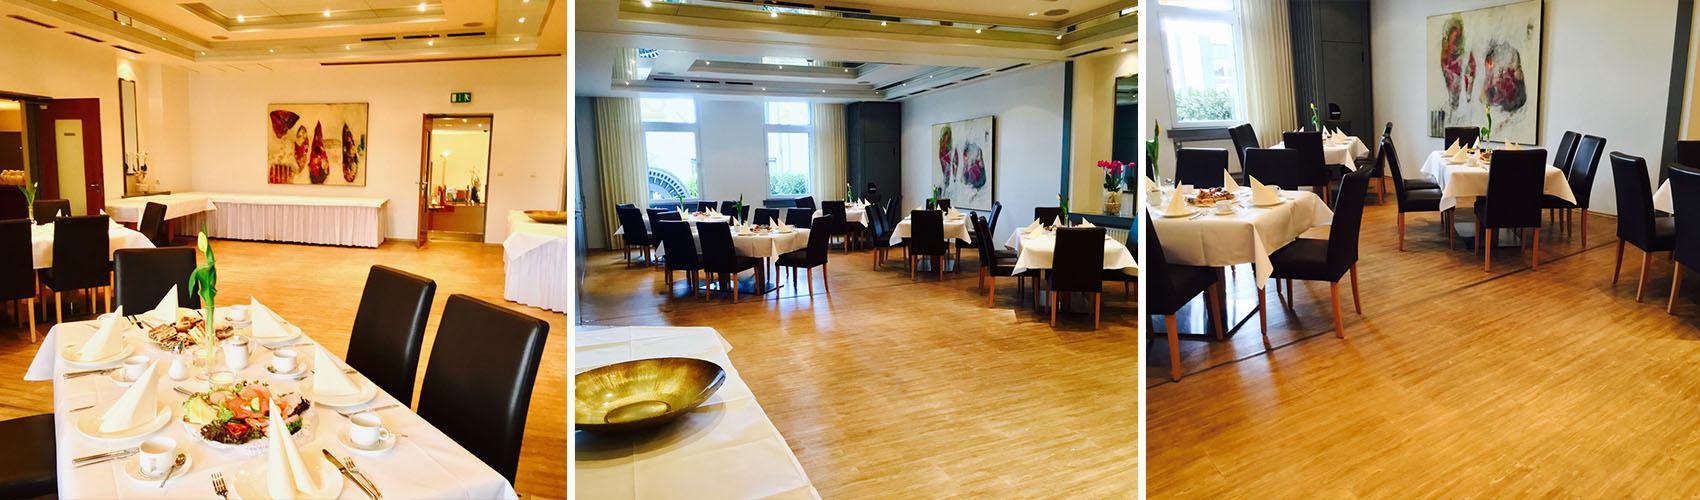 lemarron Restaurant - Spiegelsaal - Dekorationsbeispiel